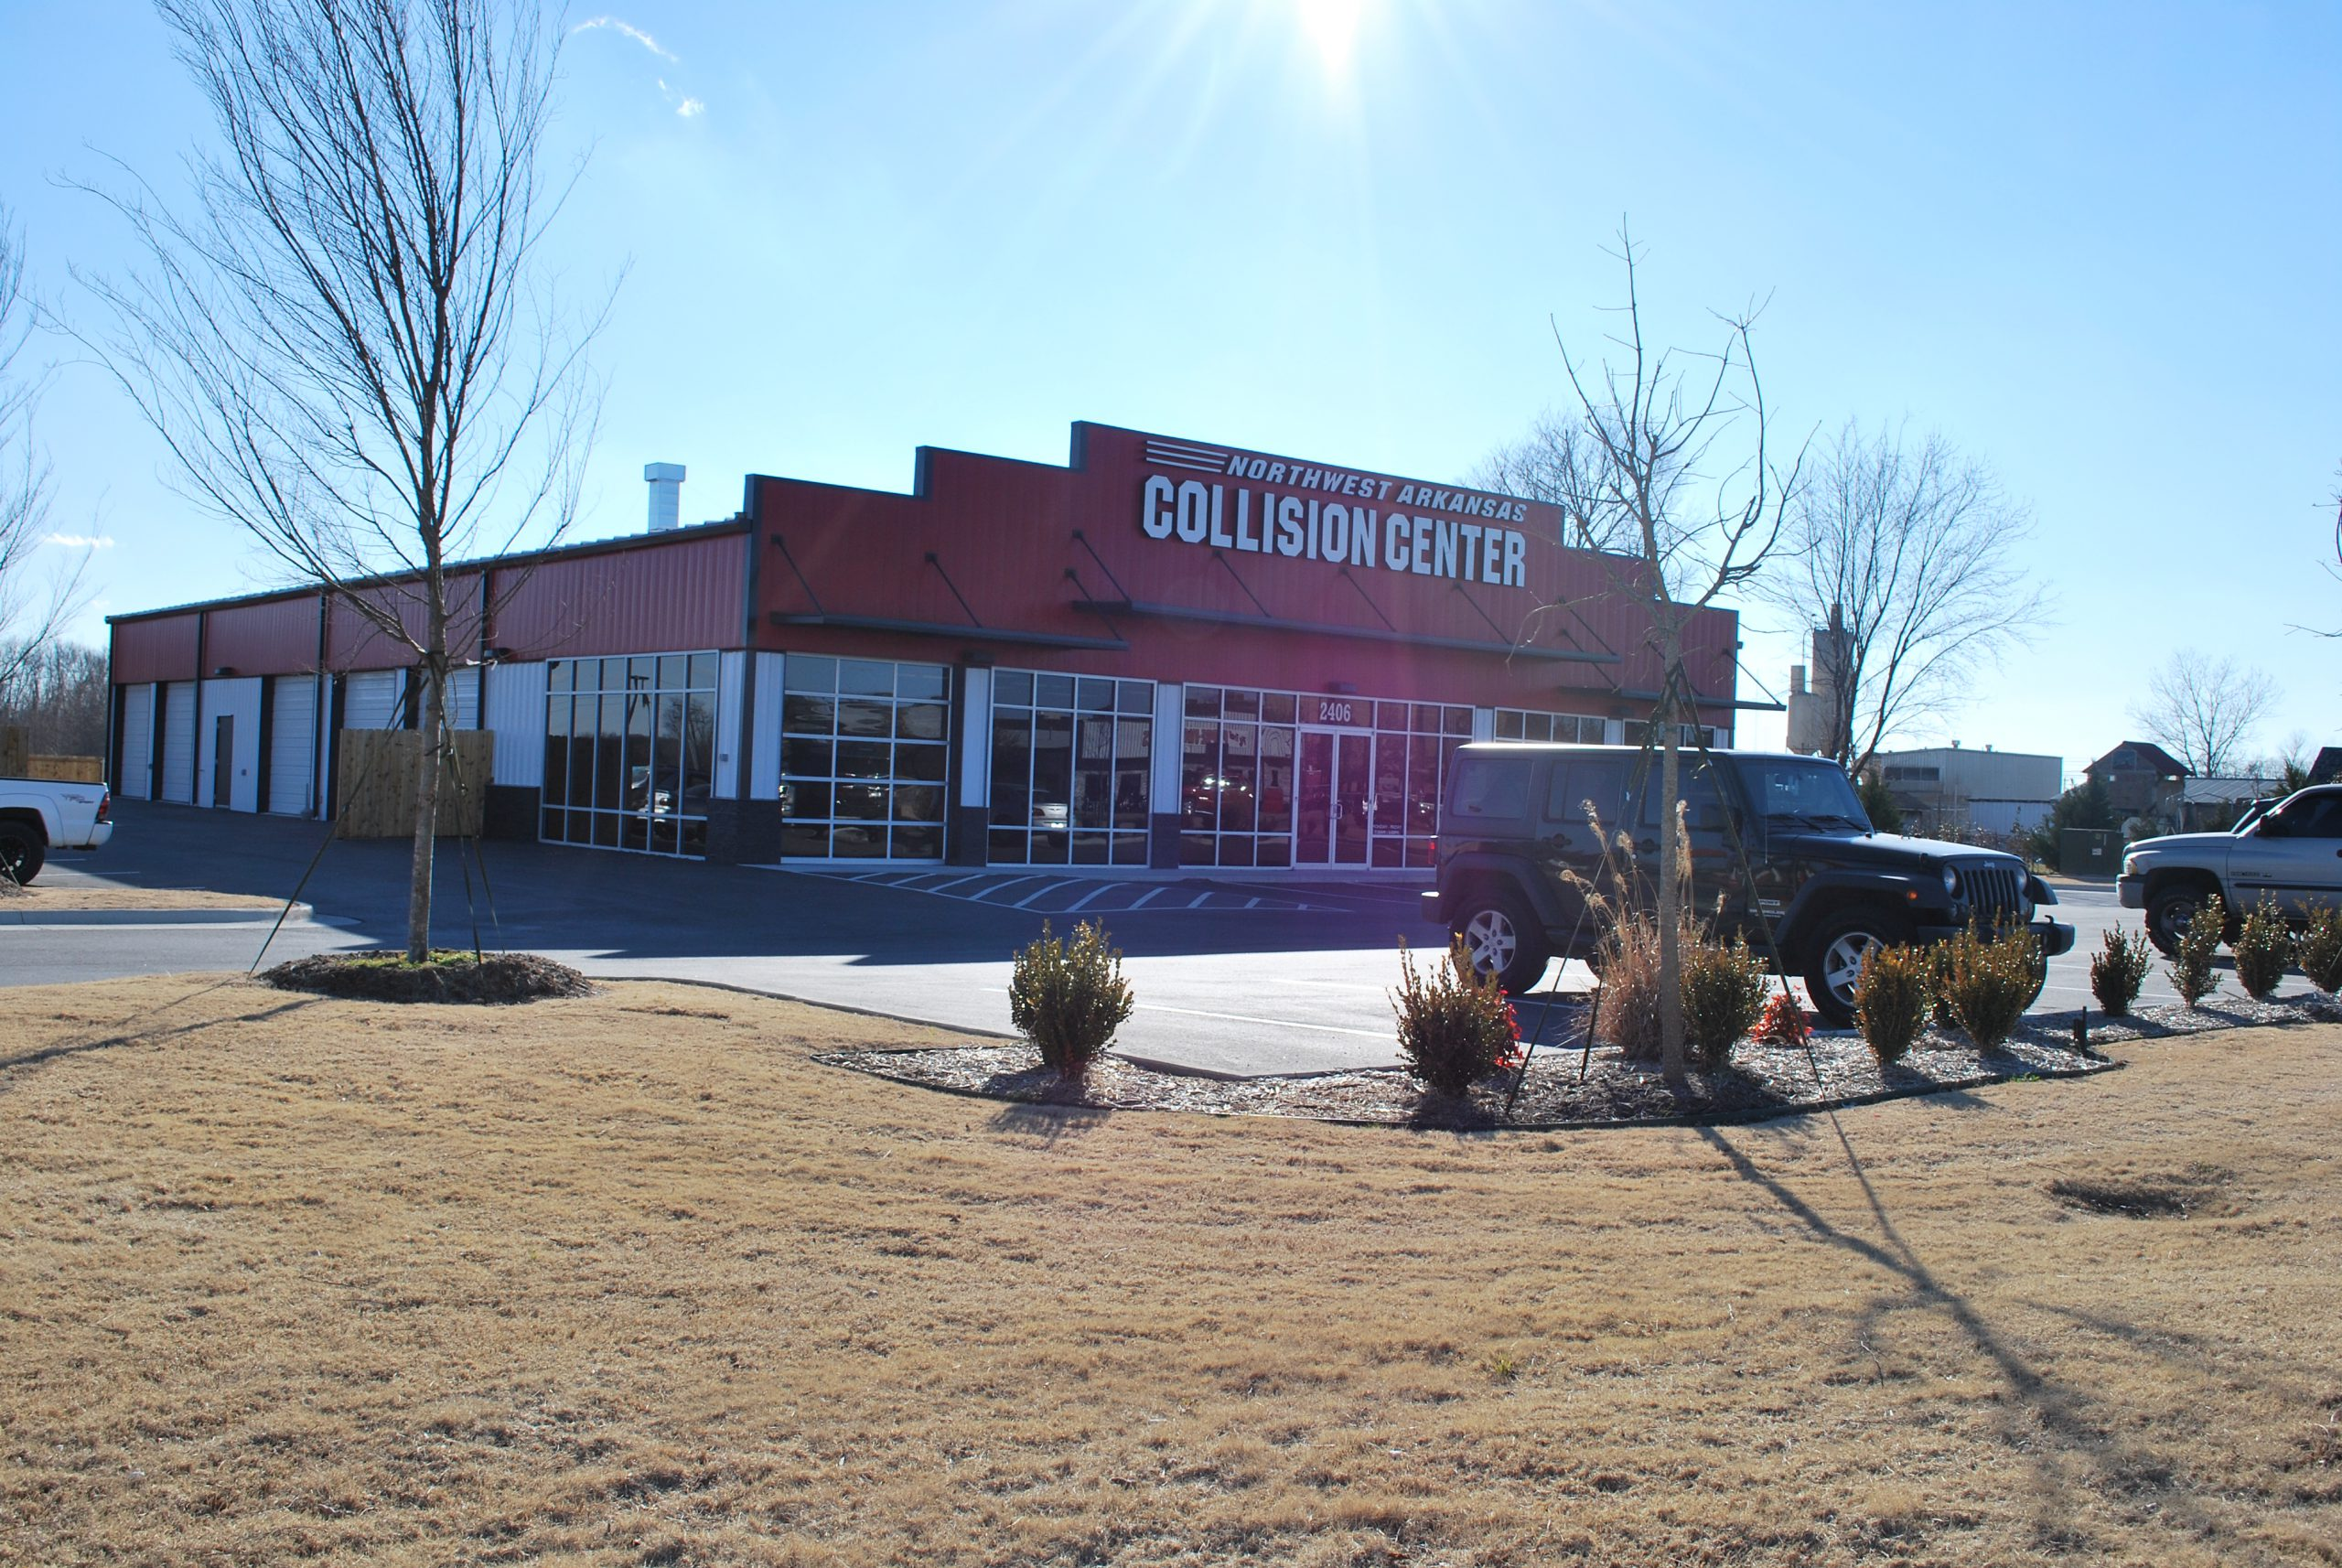 NWA Collision Center